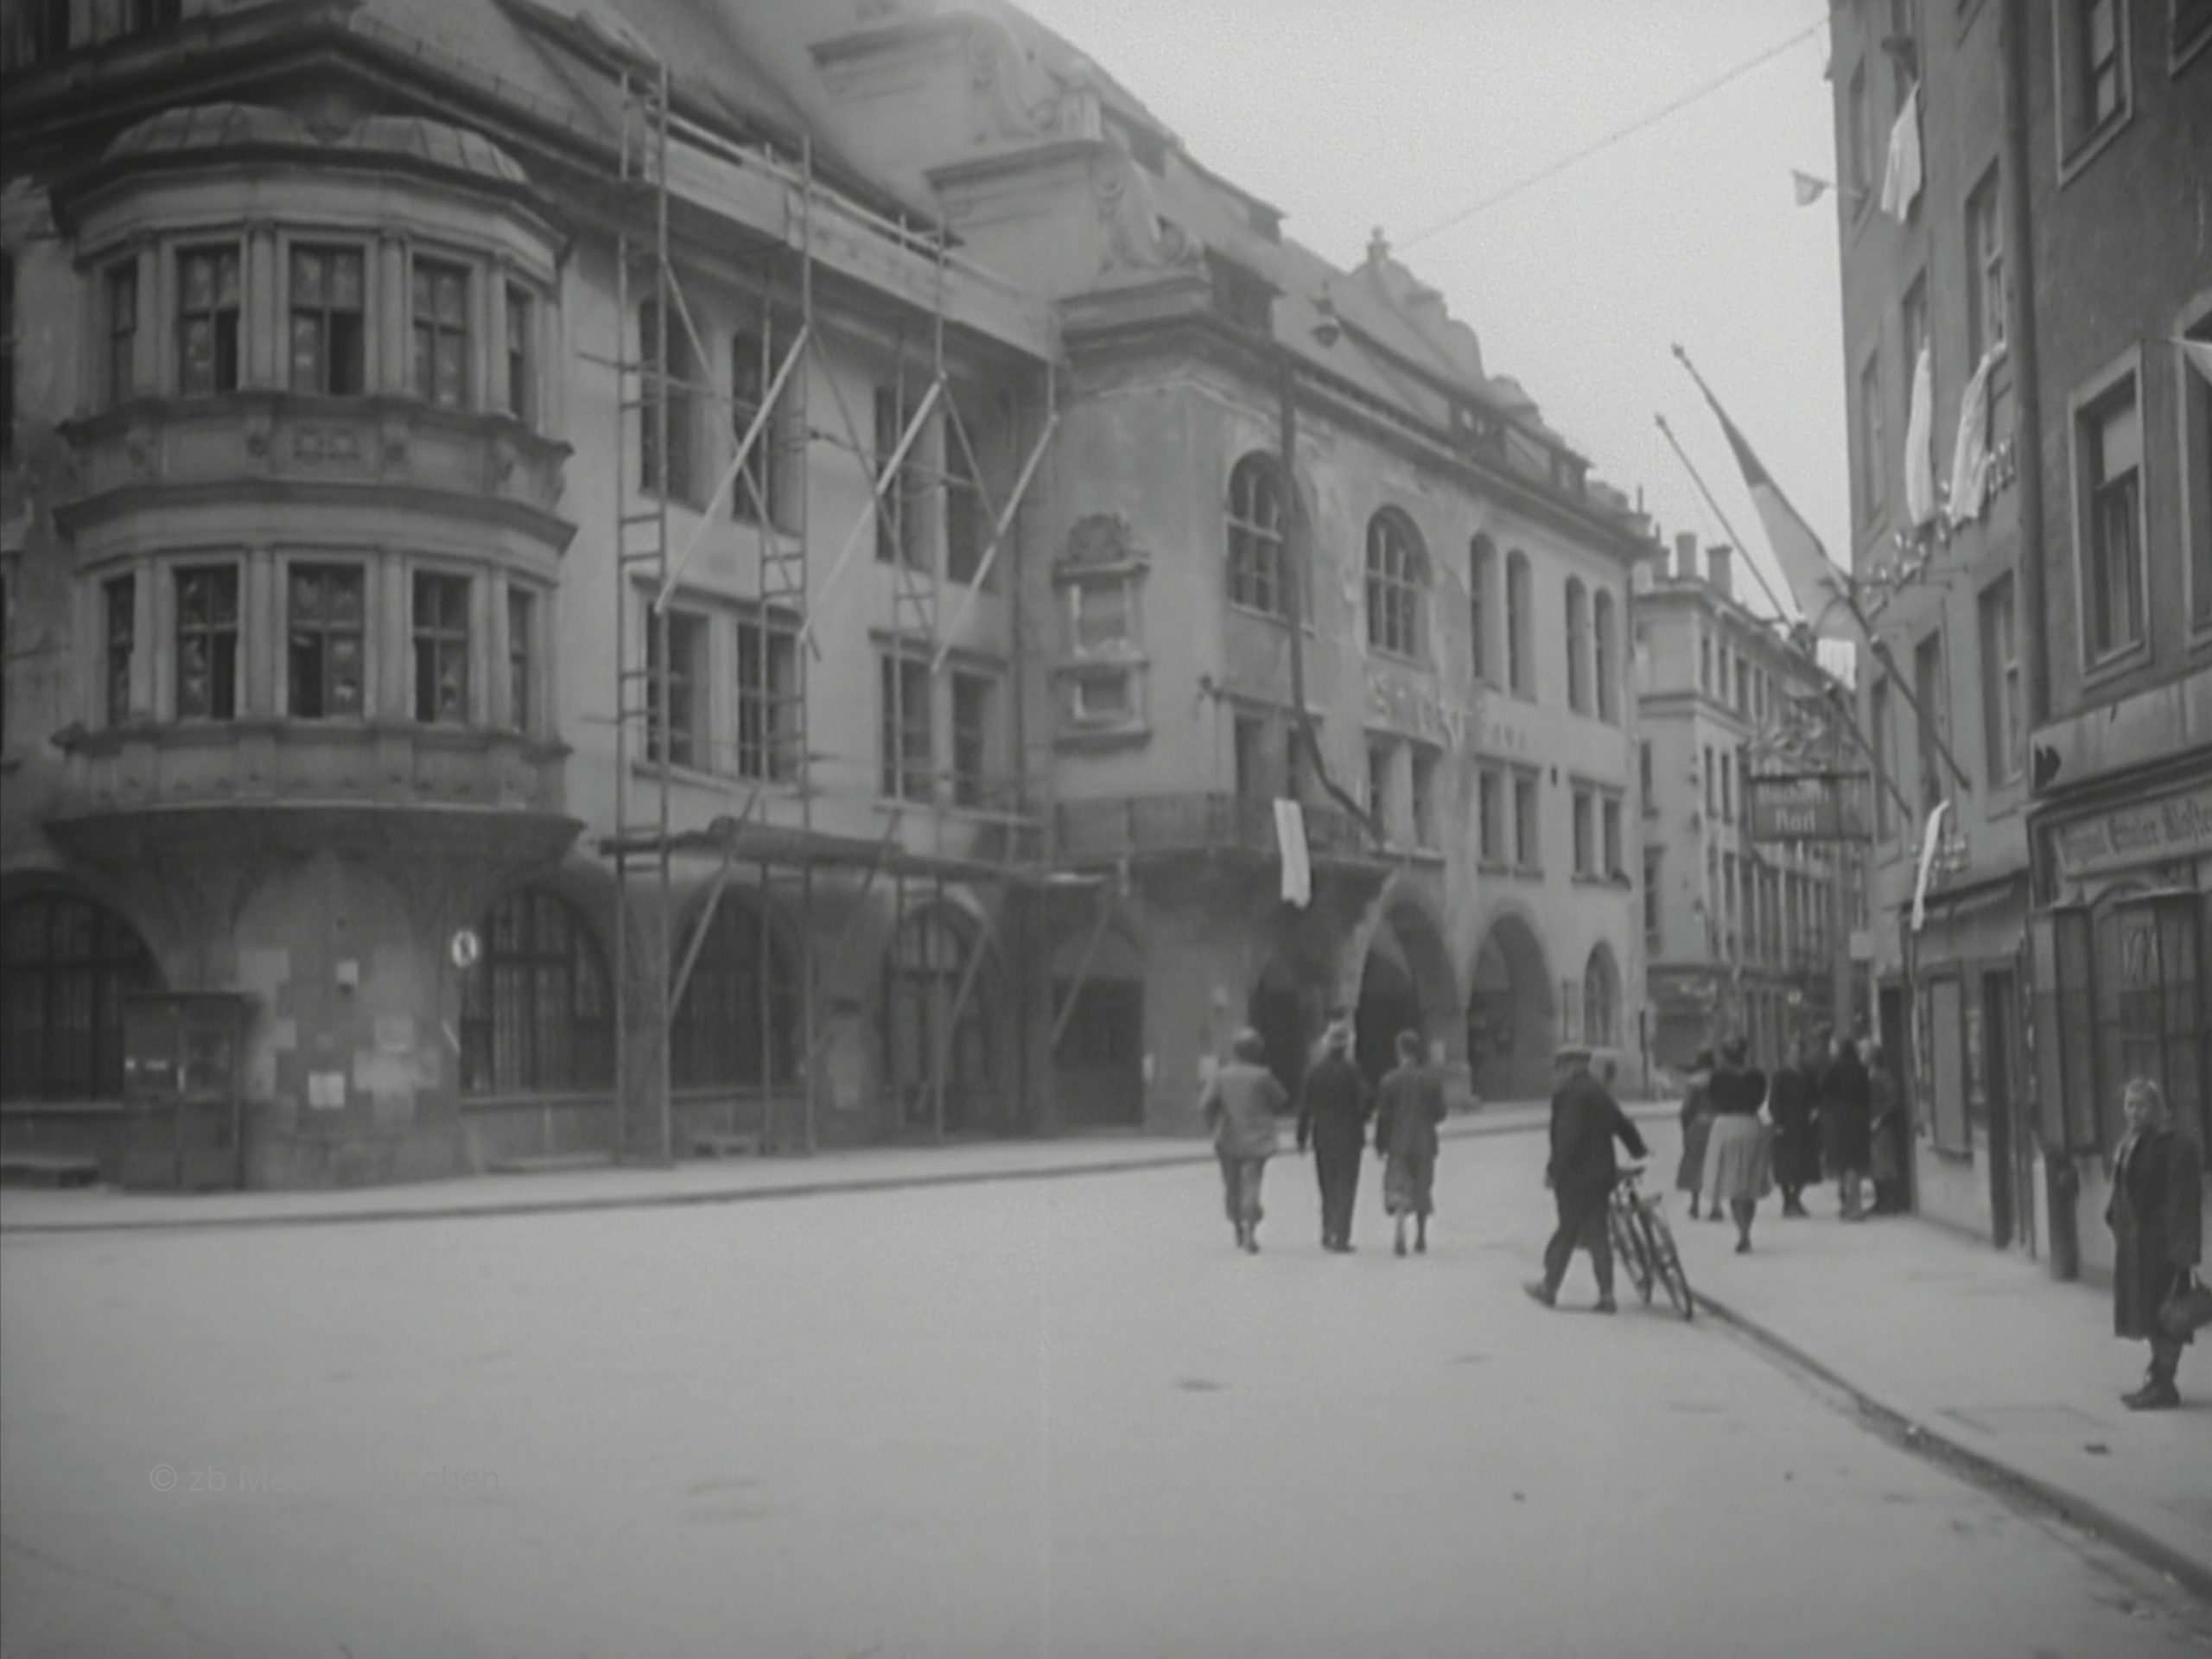 Hofbräuhaus München Mai 1945 Platzl